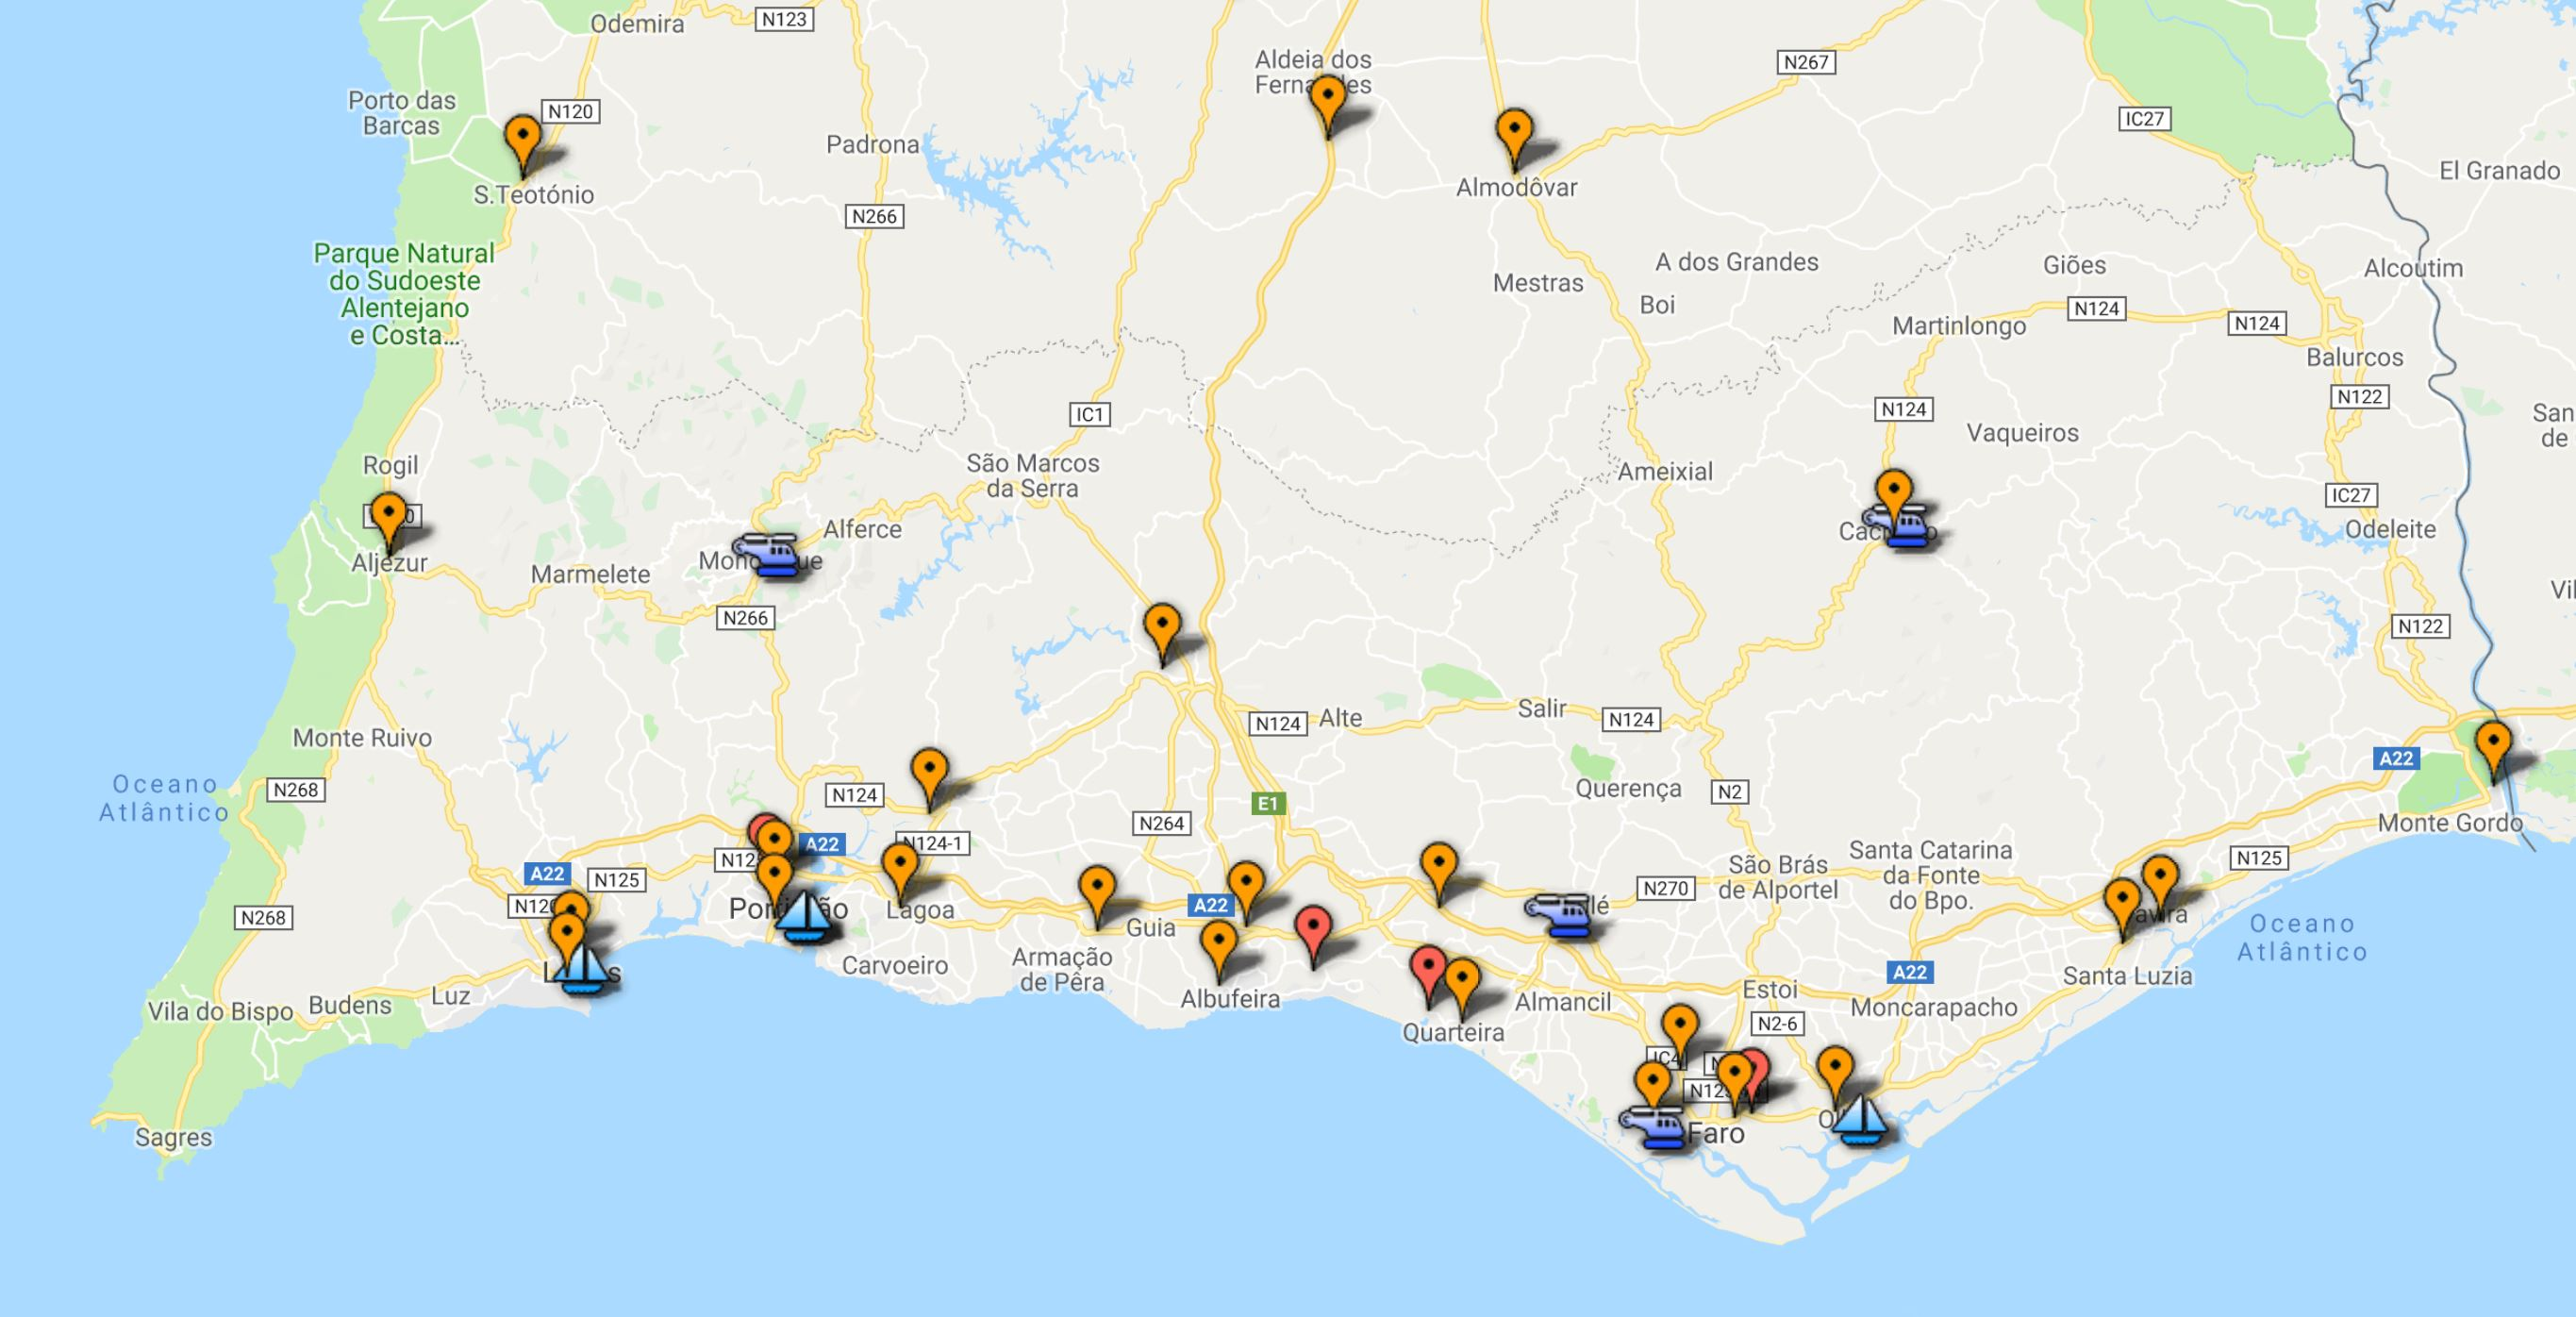 Wegen Streiks Tank Tipps Fur Algarve Fahrer Algarve Fur Entdecker